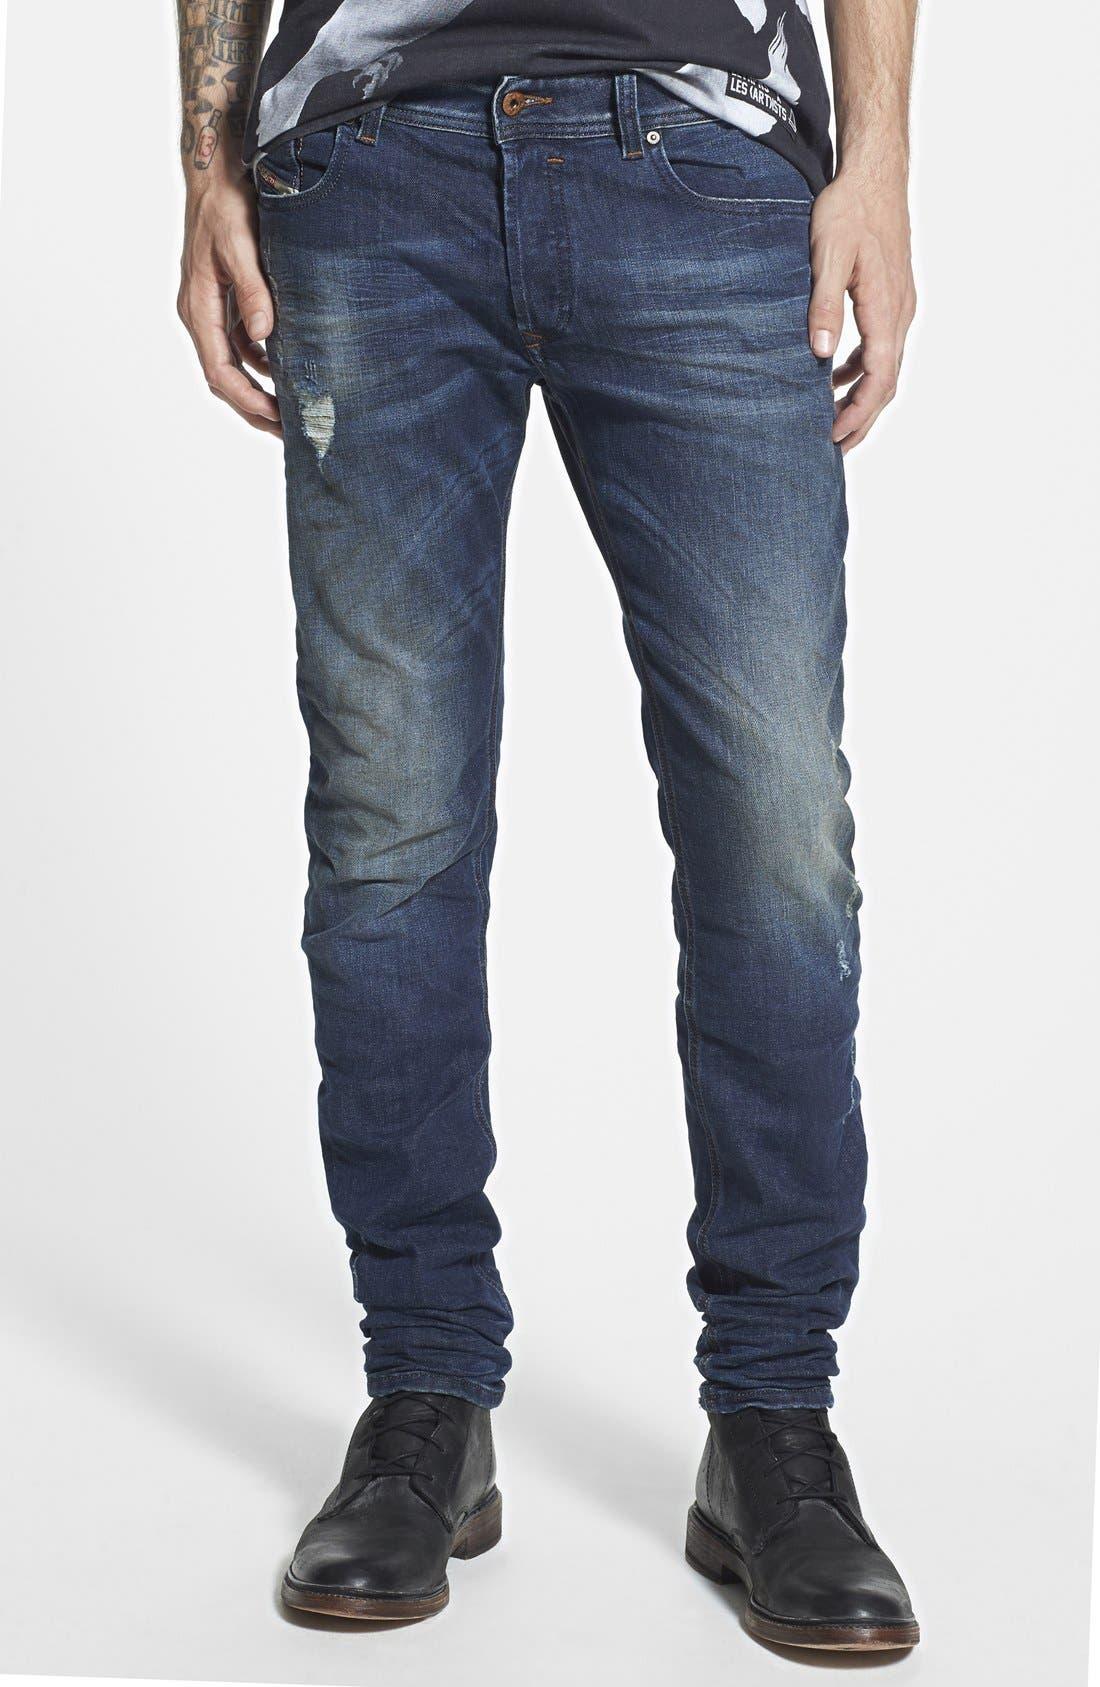 'Sleenker' Skinny Fit Jeans,                             Main thumbnail 1, color,                             499